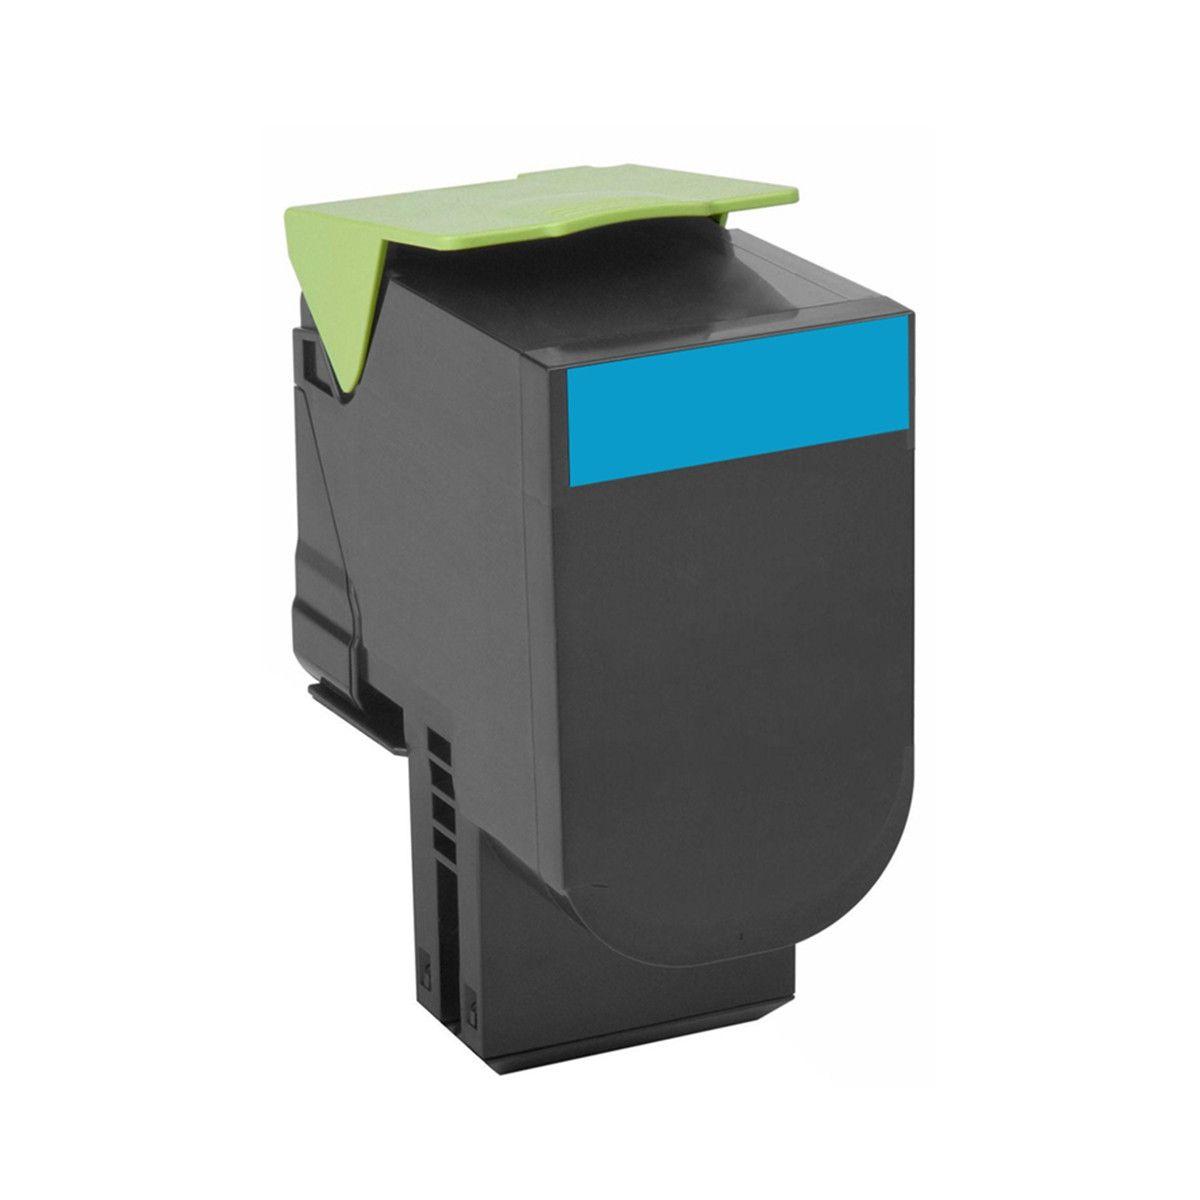 Toner compatível com Lexmark [71B4HC0] CX417DE CS417DN CX417 CS417 417DE 417DN Ciano 3.500 Páginas - Cartucho & Cia